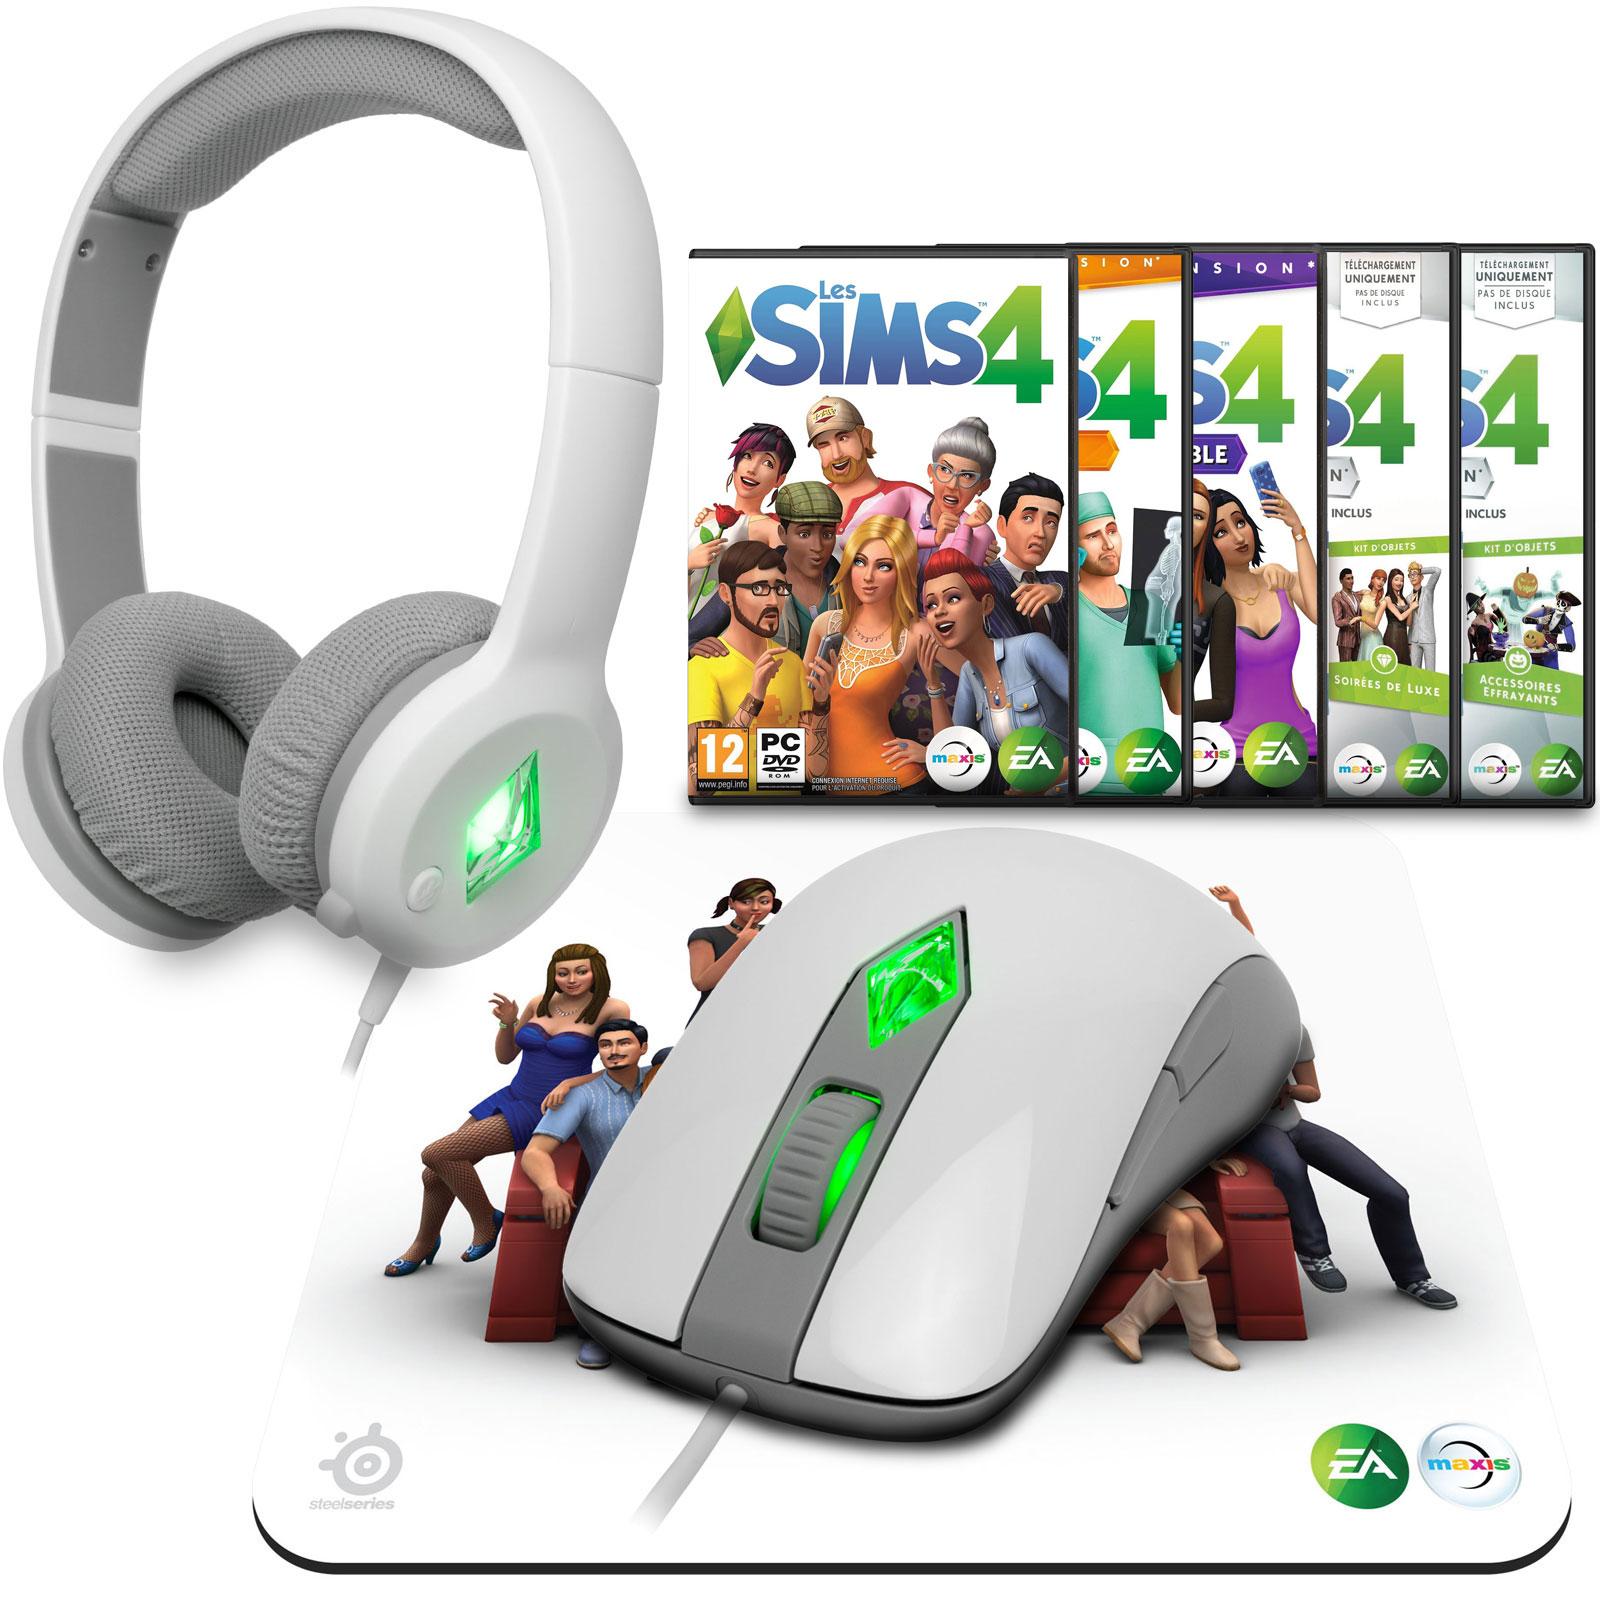 the sims 4 fan pack souris pc electronic arts sur ldlc. Black Bedroom Furniture Sets. Home Design Ideas